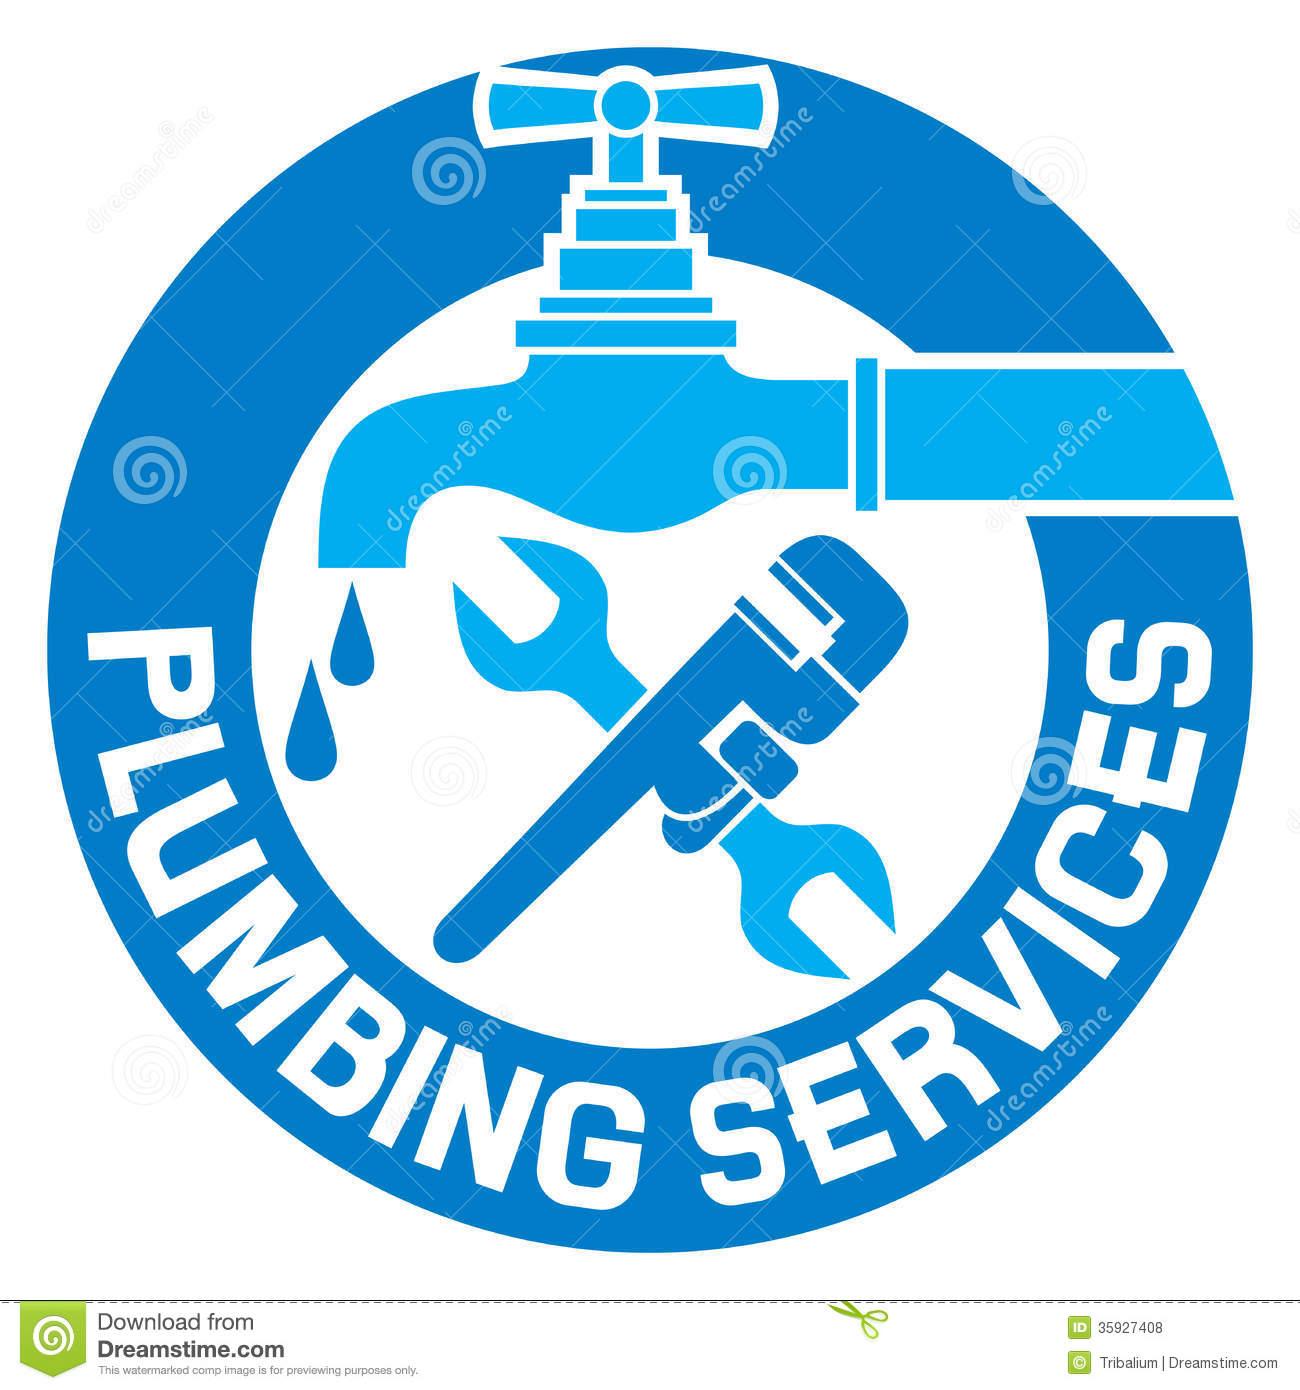 Free plumbing logos clipart vector library 9 Plumbing Icons Clip Art Images - Free Clip Art of Water Faucet ... vector library